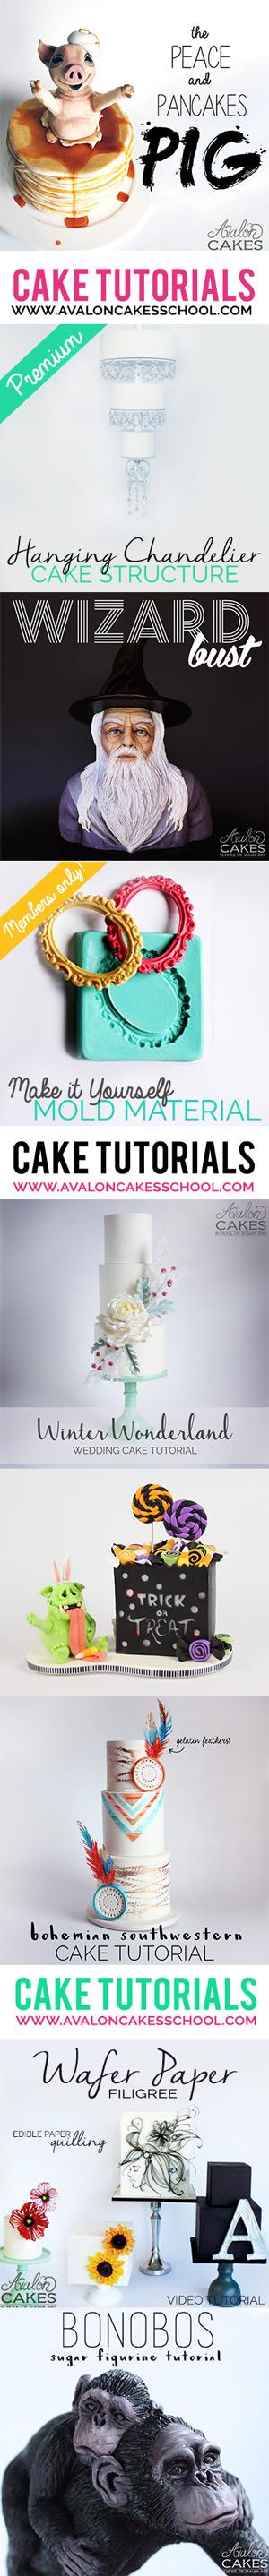 avalon-cakes-school-tutorials-cake-sugar-figurines-3d-sculpted-novelty